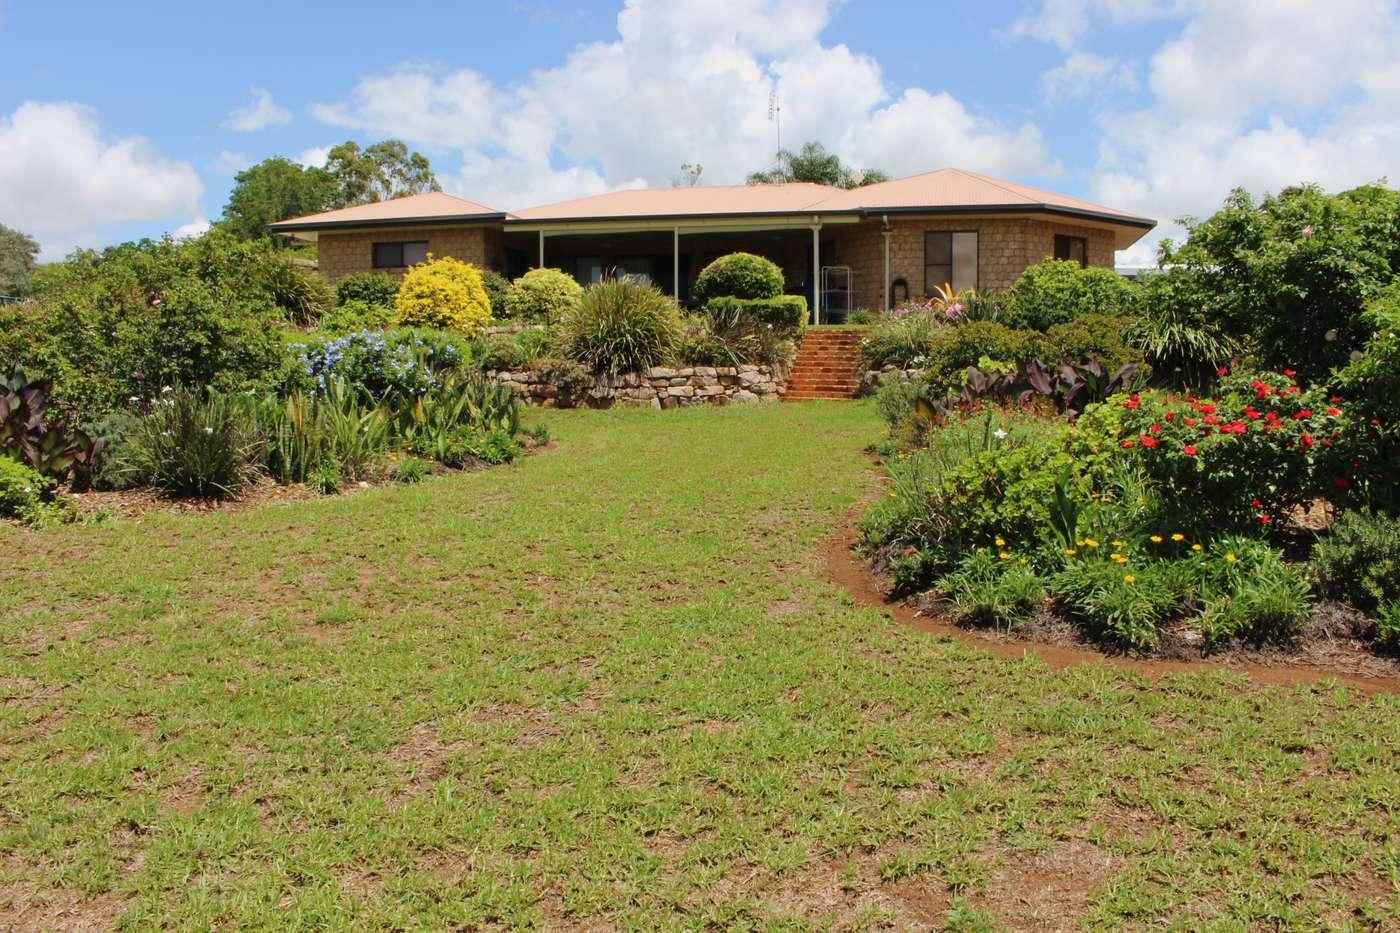 Main view of Homely house listing, 34-36 MACAULAY DRIVE, Kingaroy, QLD 4610